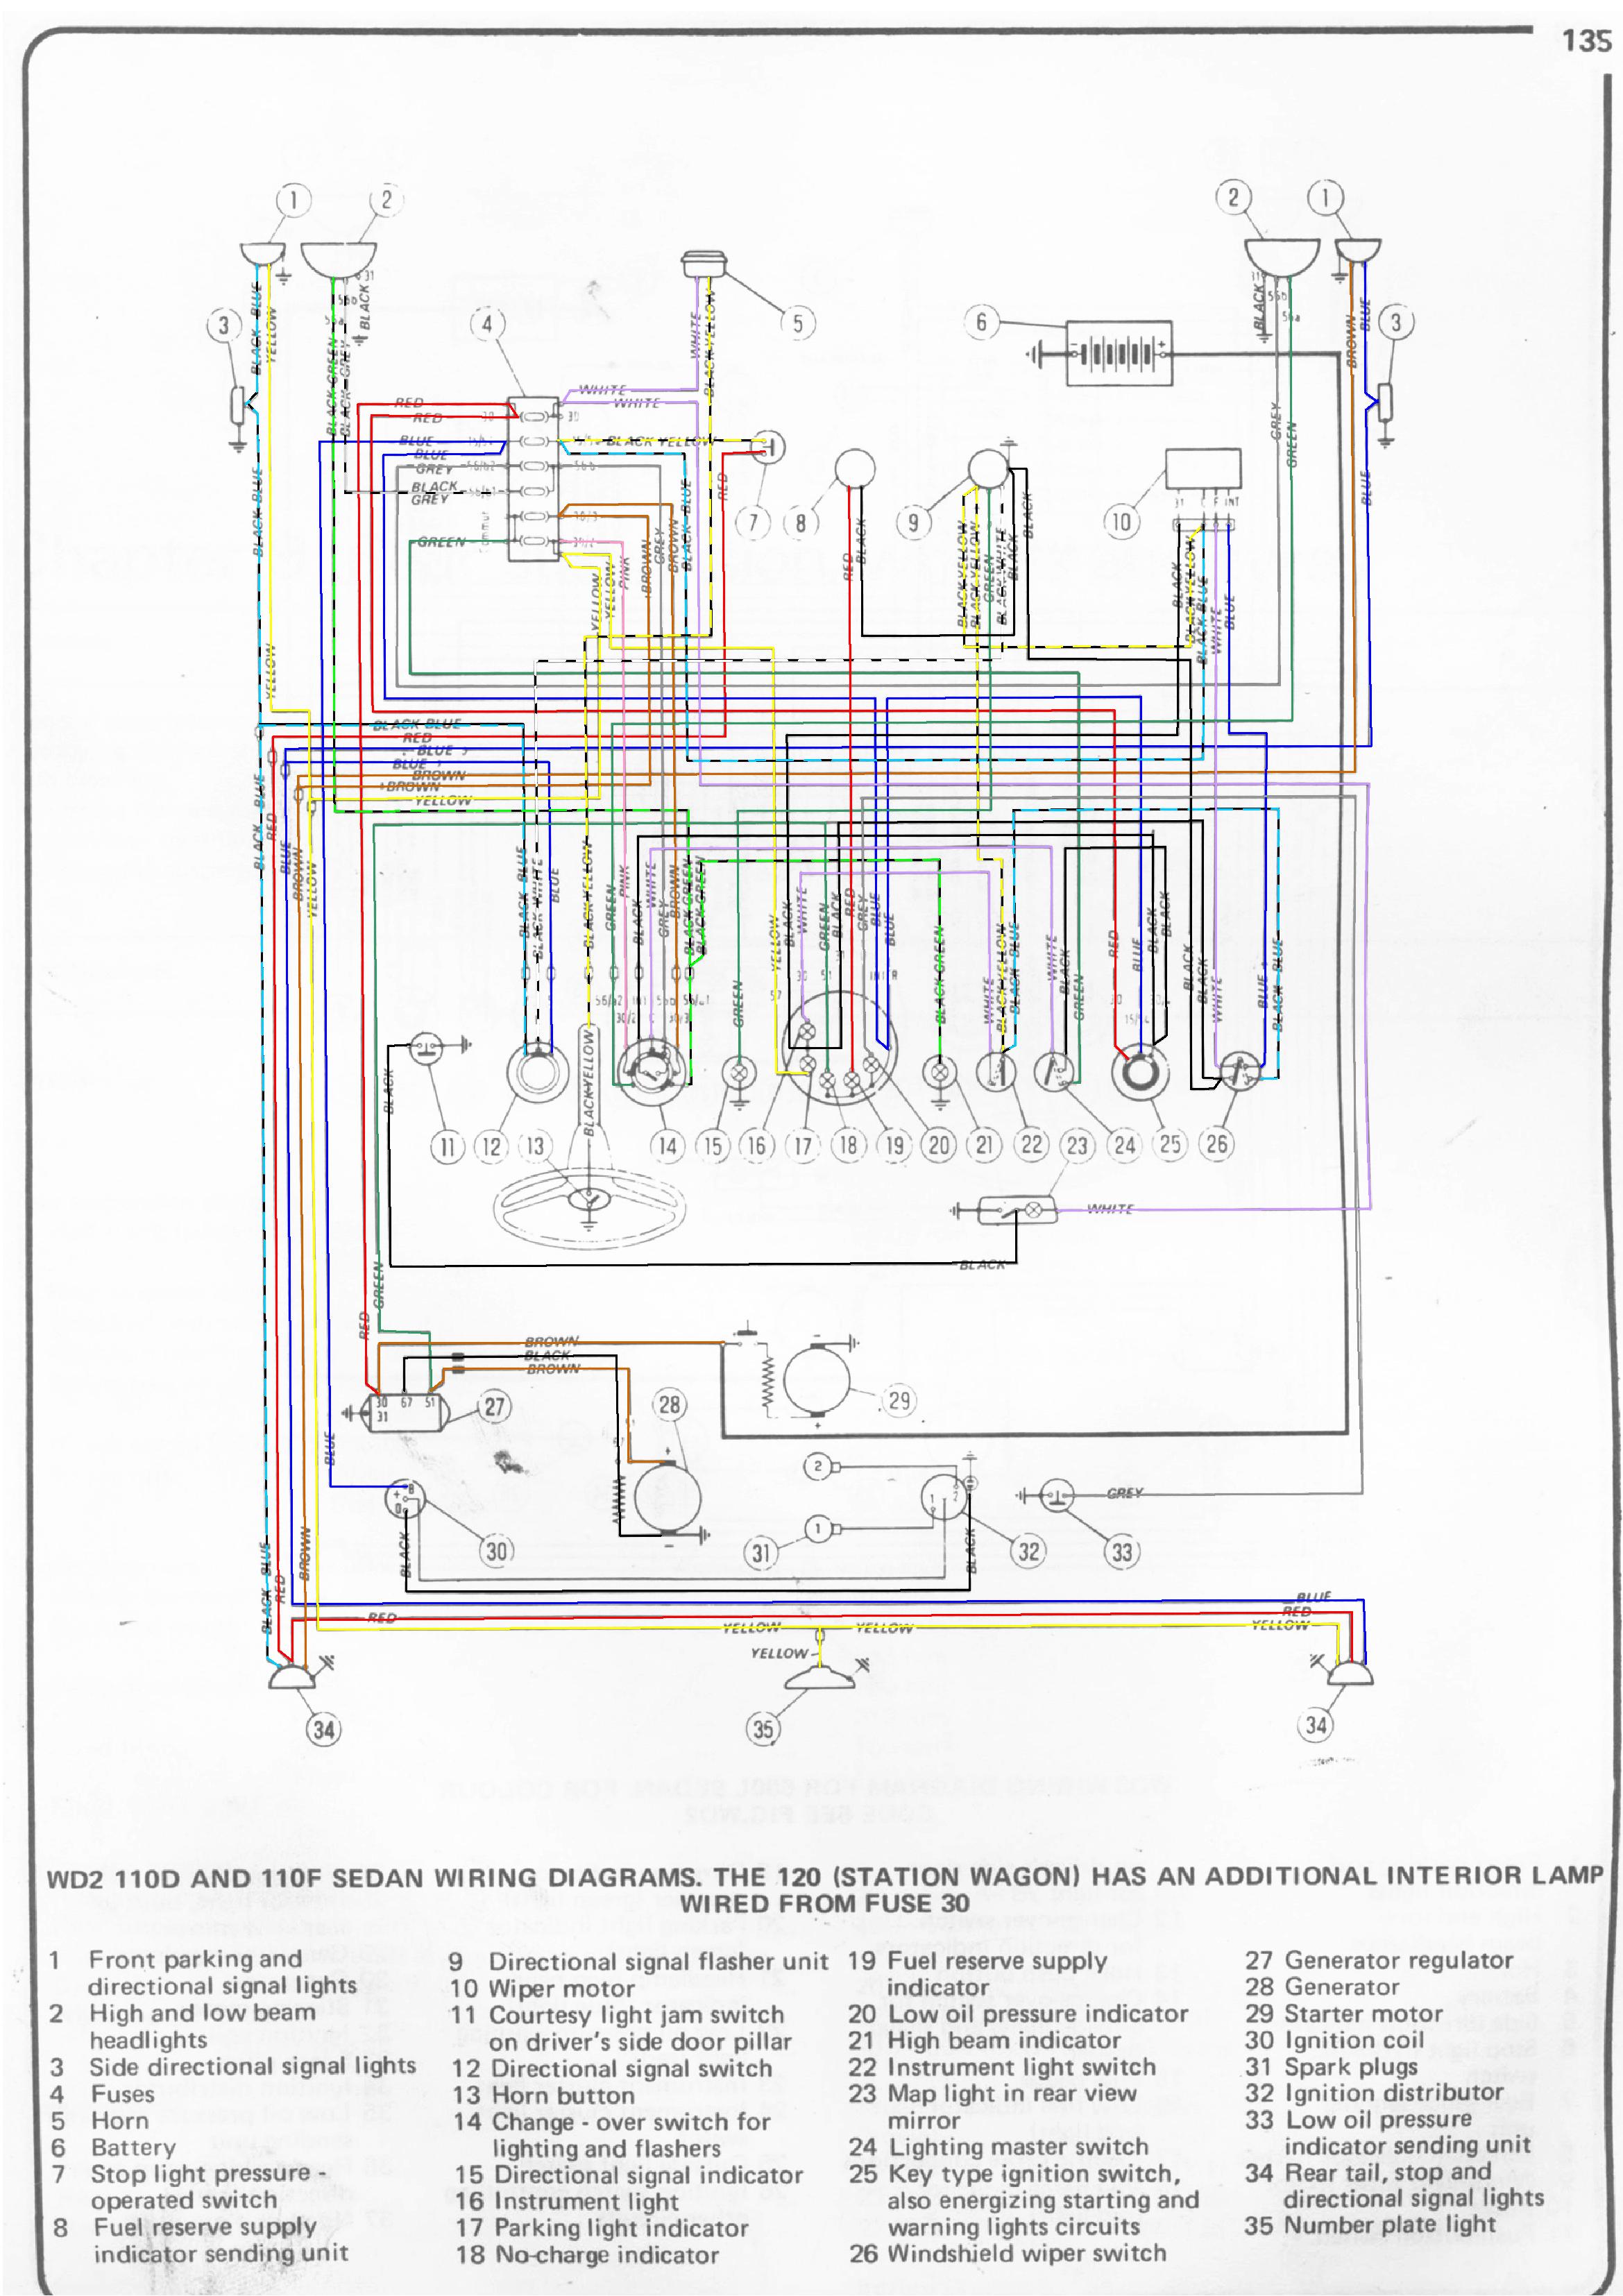 Fiat Cinquecento Wiring Diagram Libraries Directionals For Rat Rod 500 Third Level1967 Diagrams